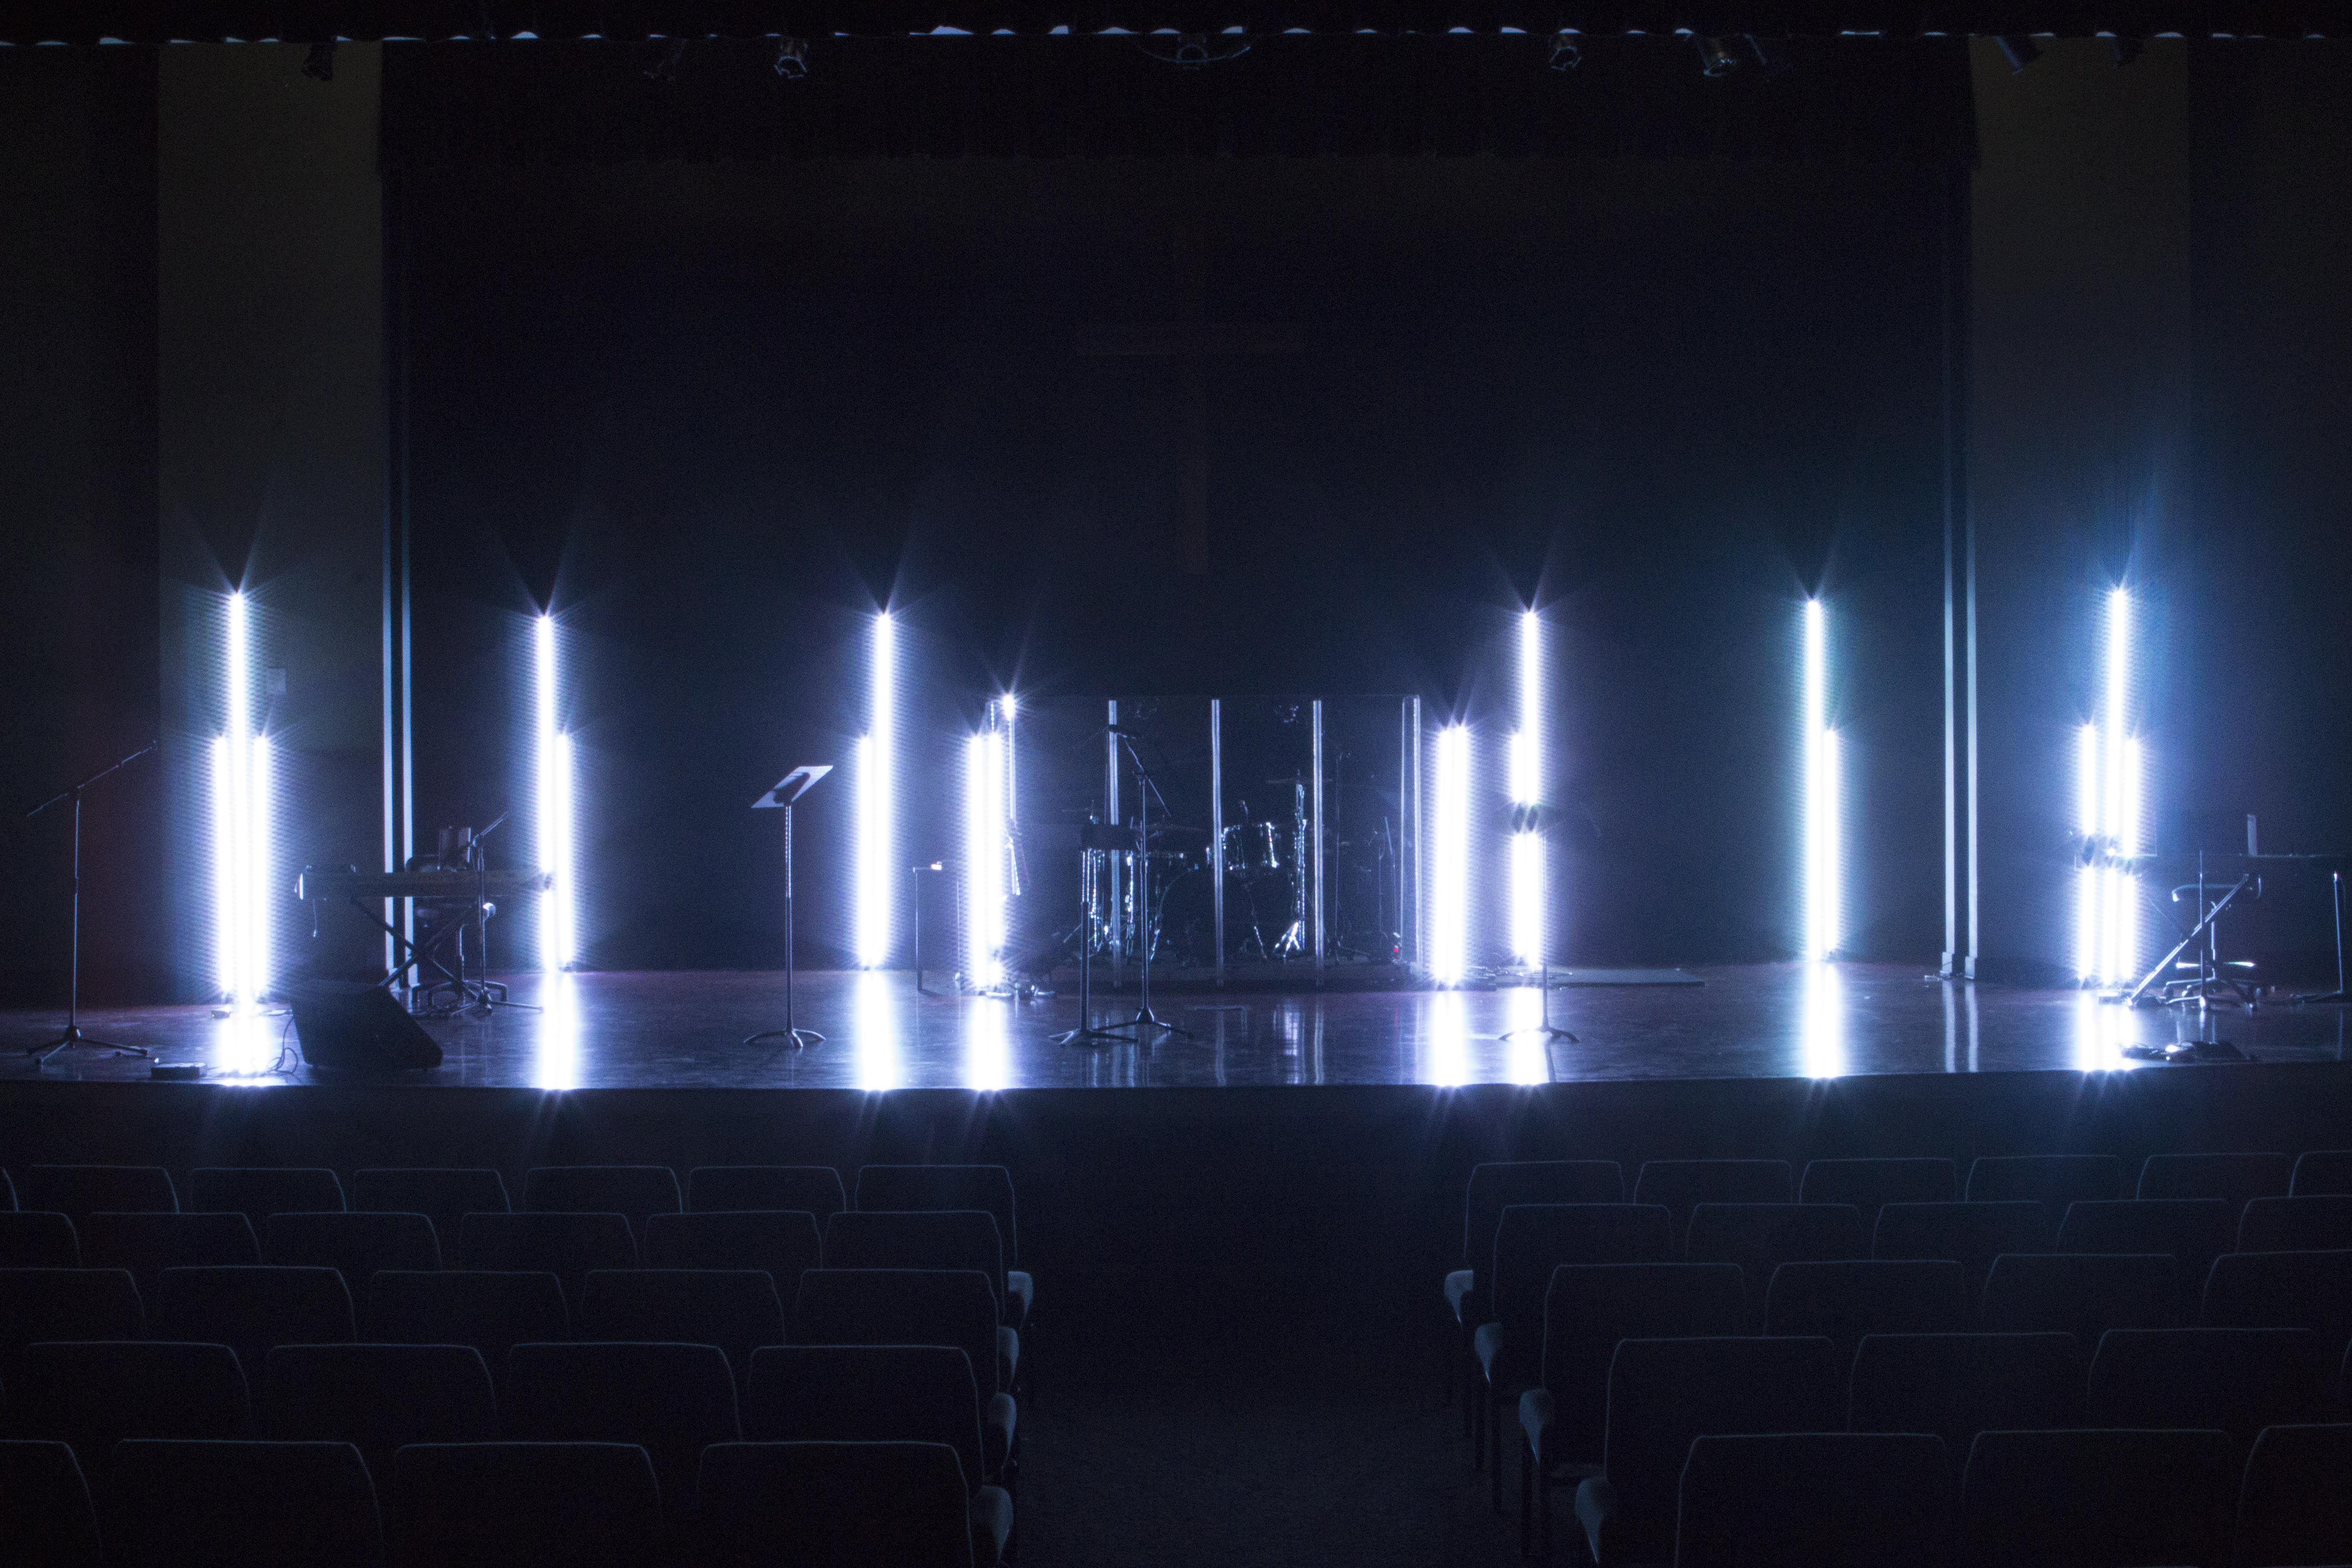 Led Glow Sticks Stage Lighting Design Church Stage Design Led Stage Lights